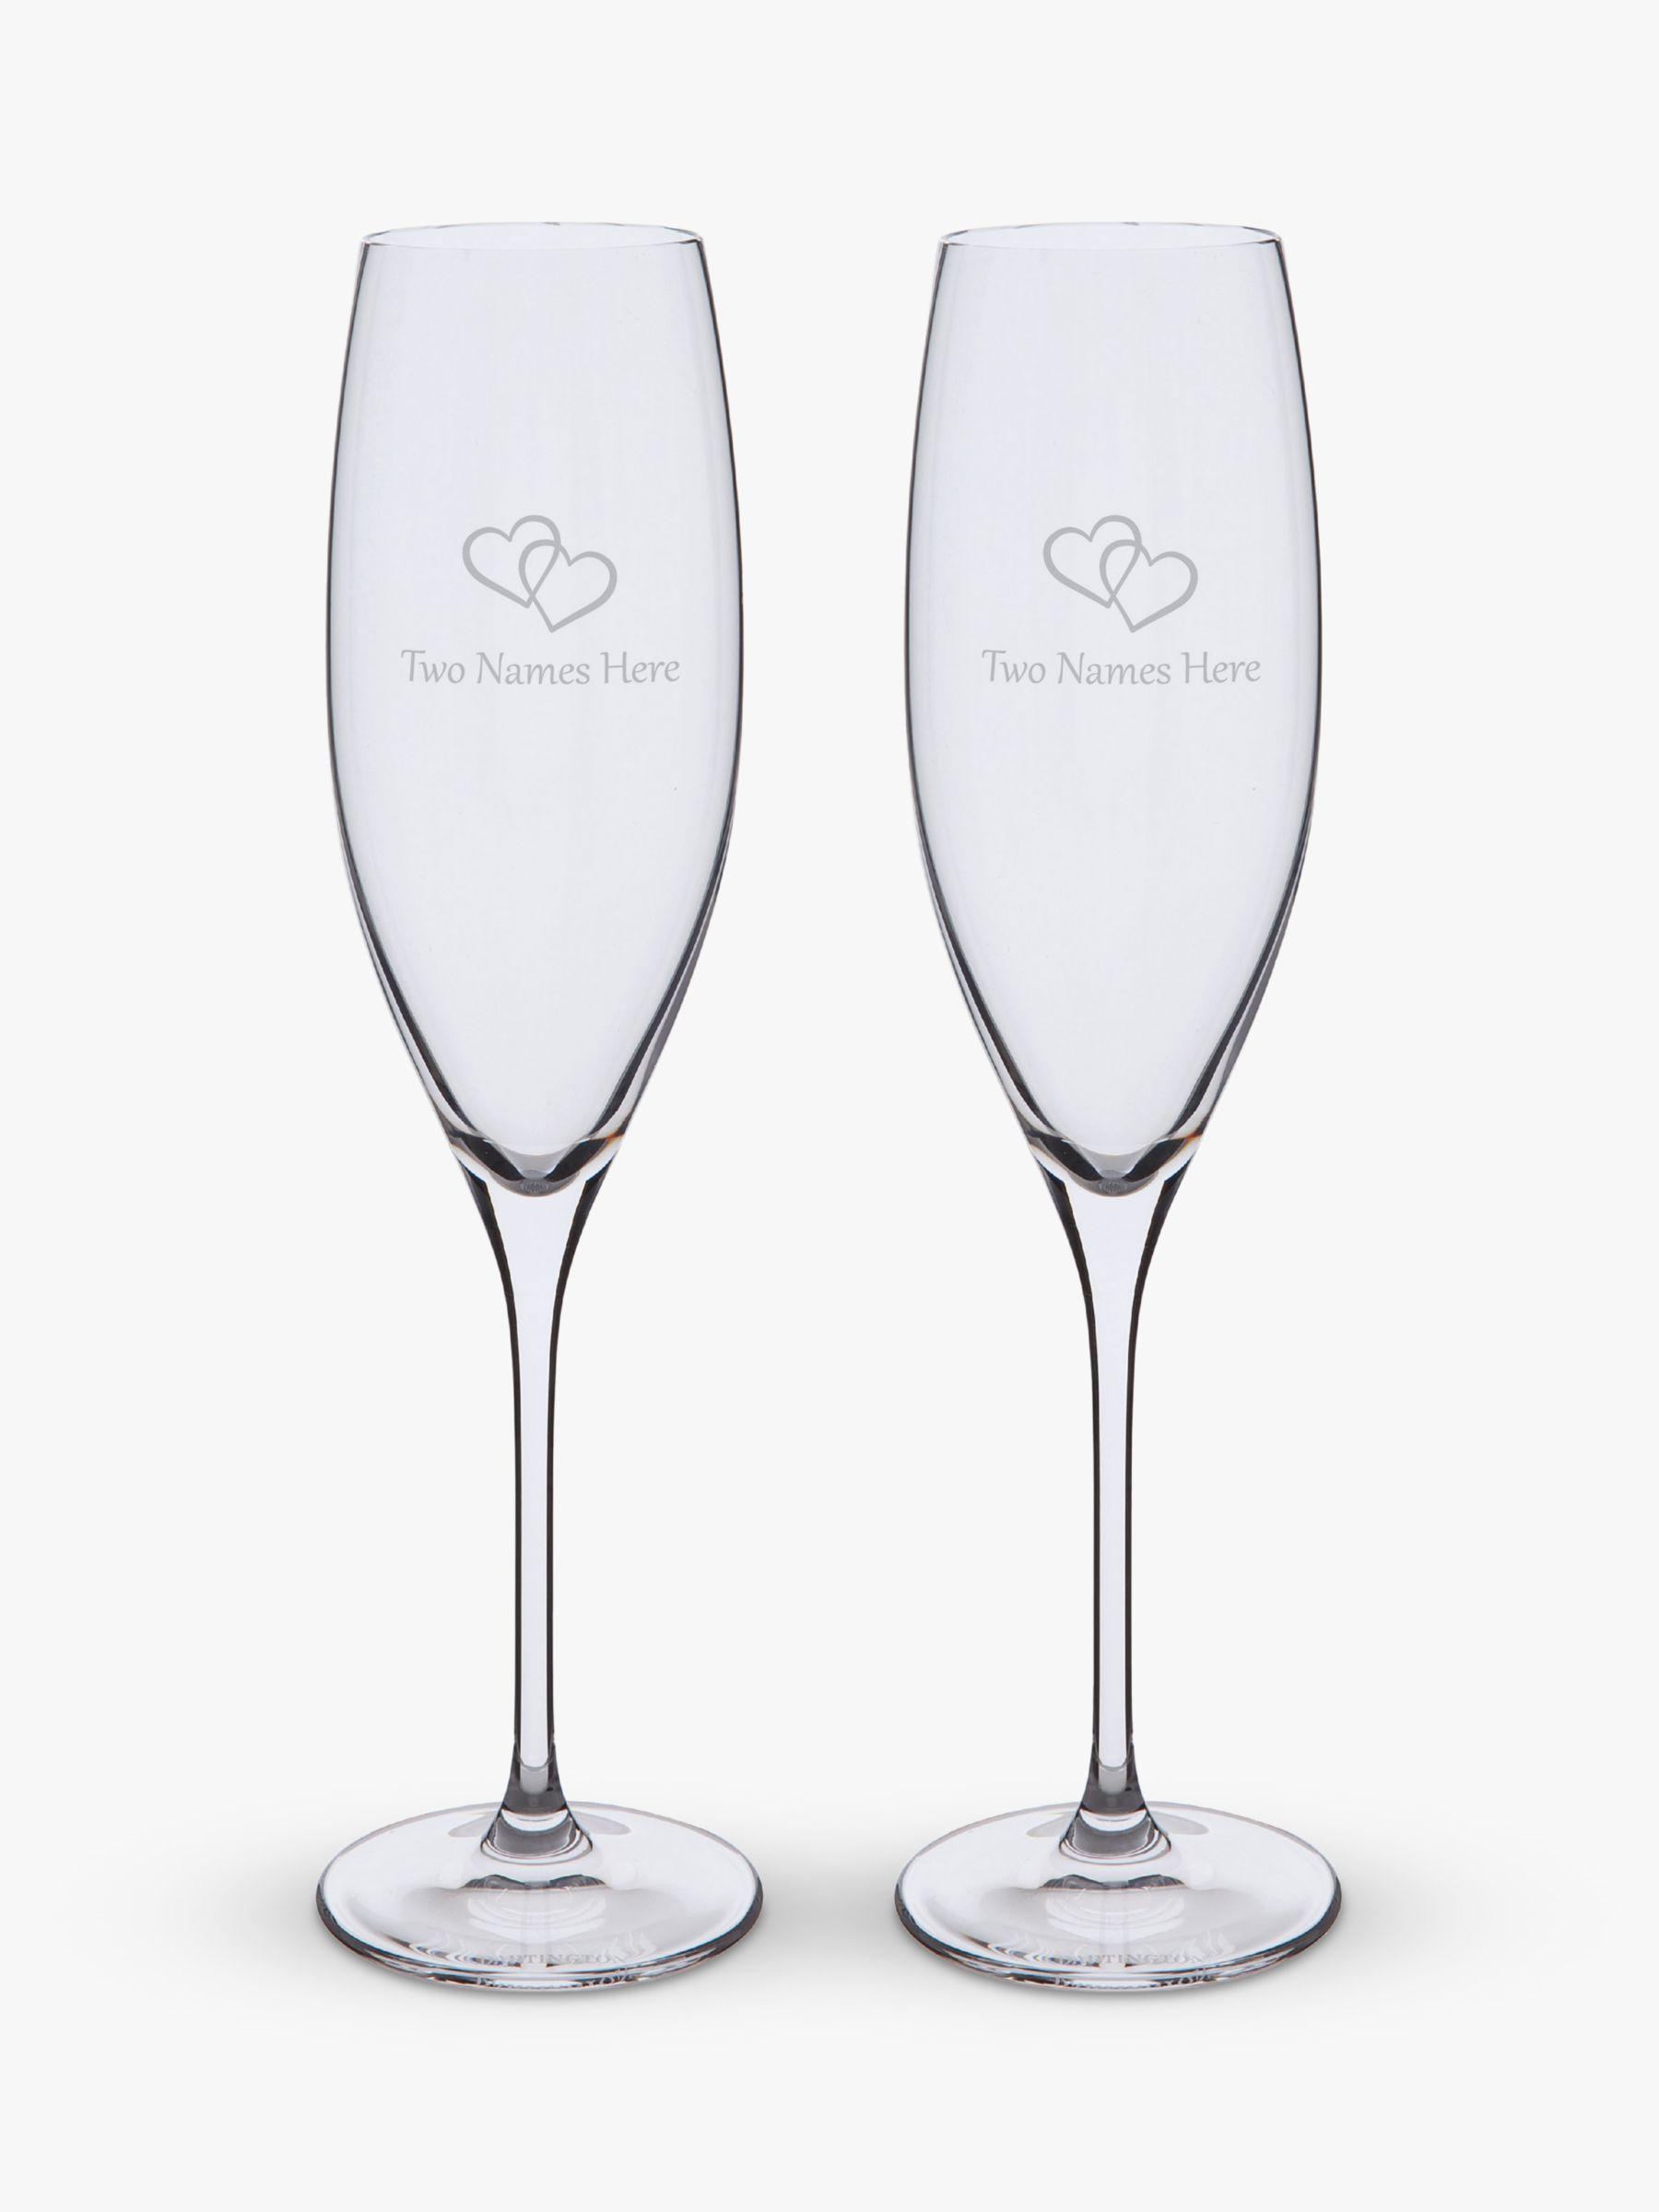 Dartington Crystal Dartington Crystal Personalised Love Heart Flutes, Set of 2, 200ml, Gabriola Font, Clear